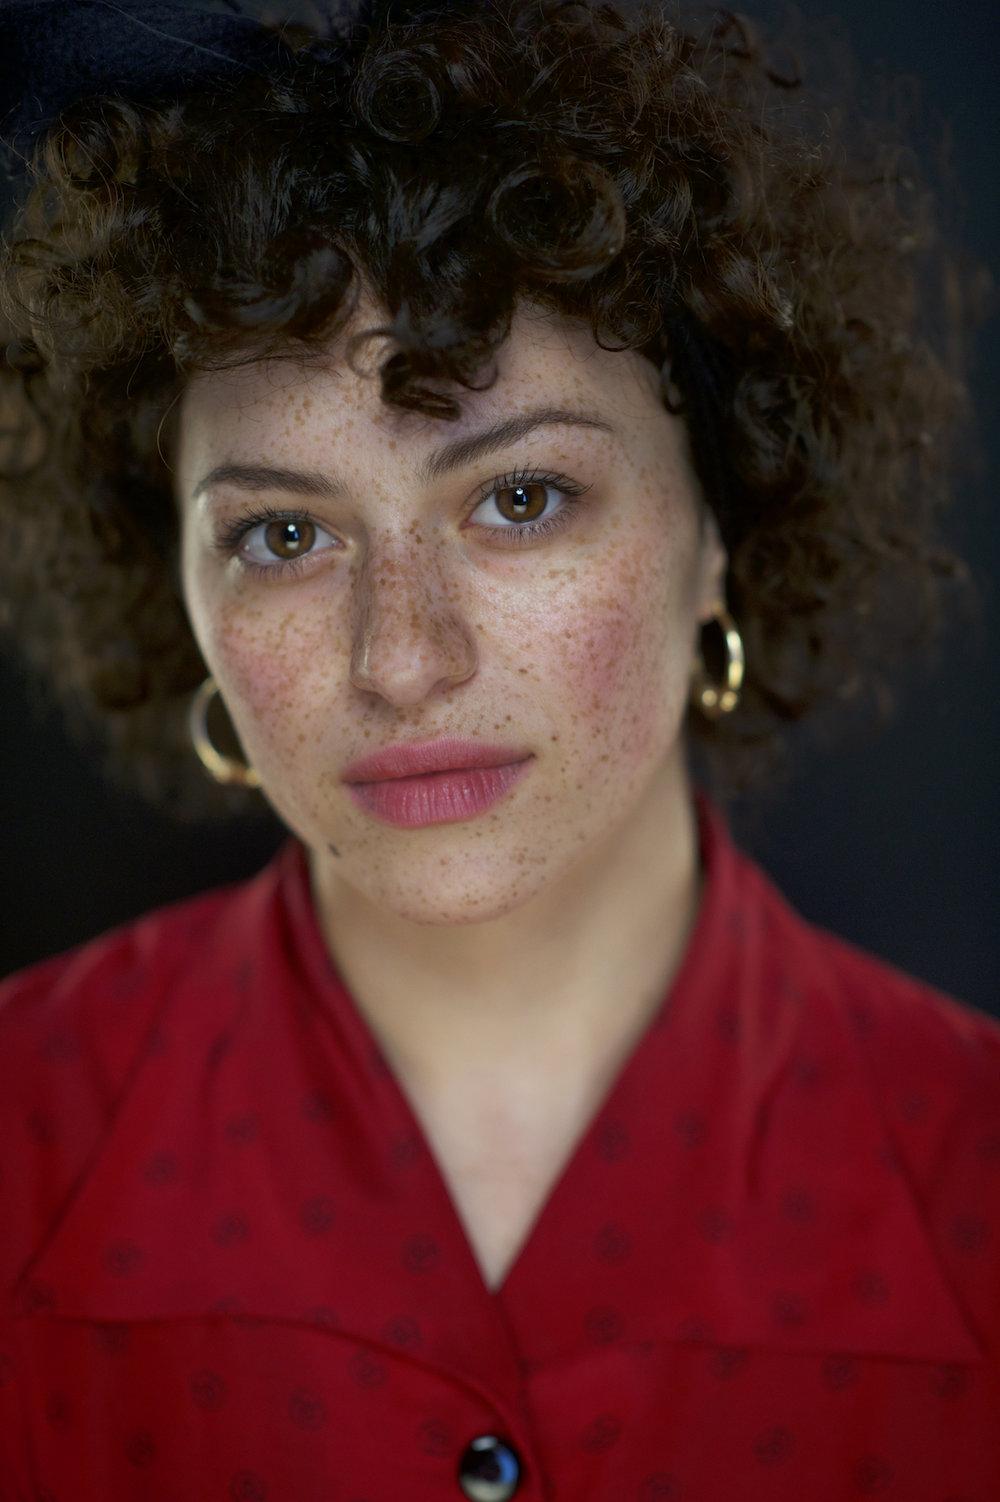 A studio portrait headshot of Alia Shawkat.  Image by New Orleans based portrait photographer, Marc Pagani